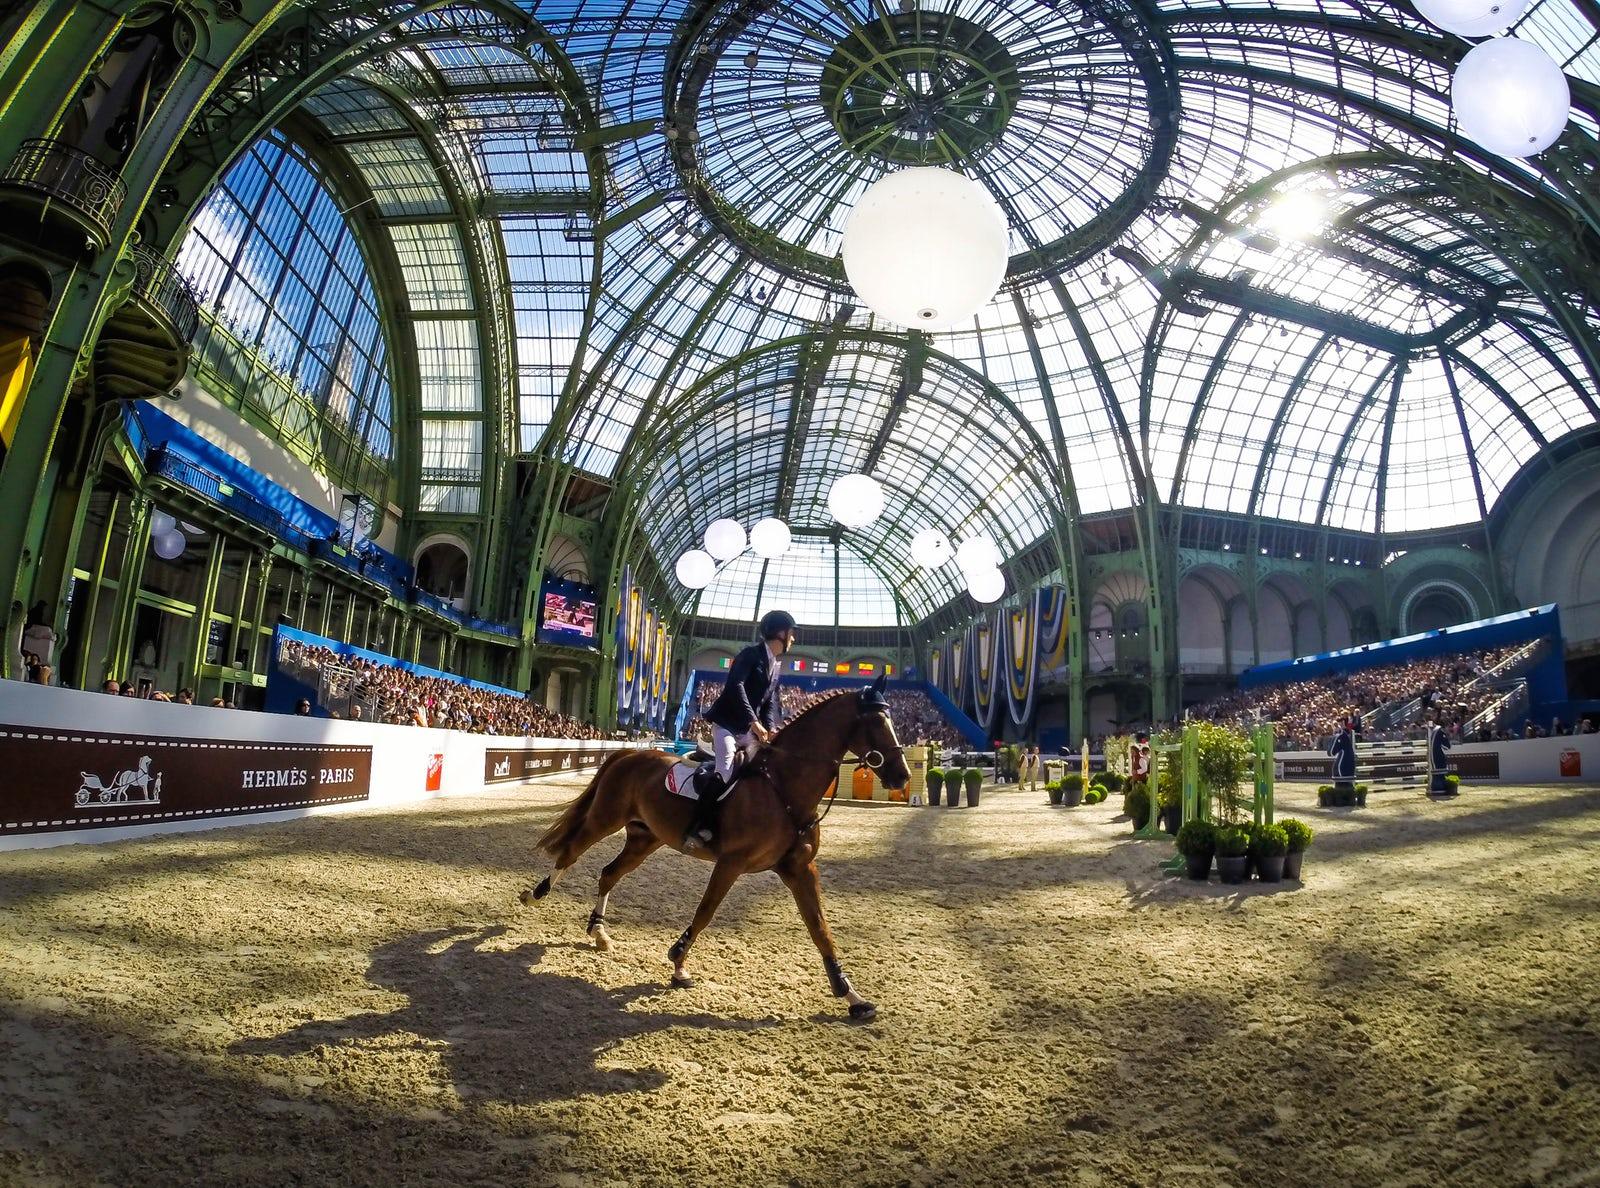 Saut Hermès at The Grand Palais  Bertram Allen rides Romanov during the Grand Prix Hermès CSI5, April 12th, 2015 in Paris, France